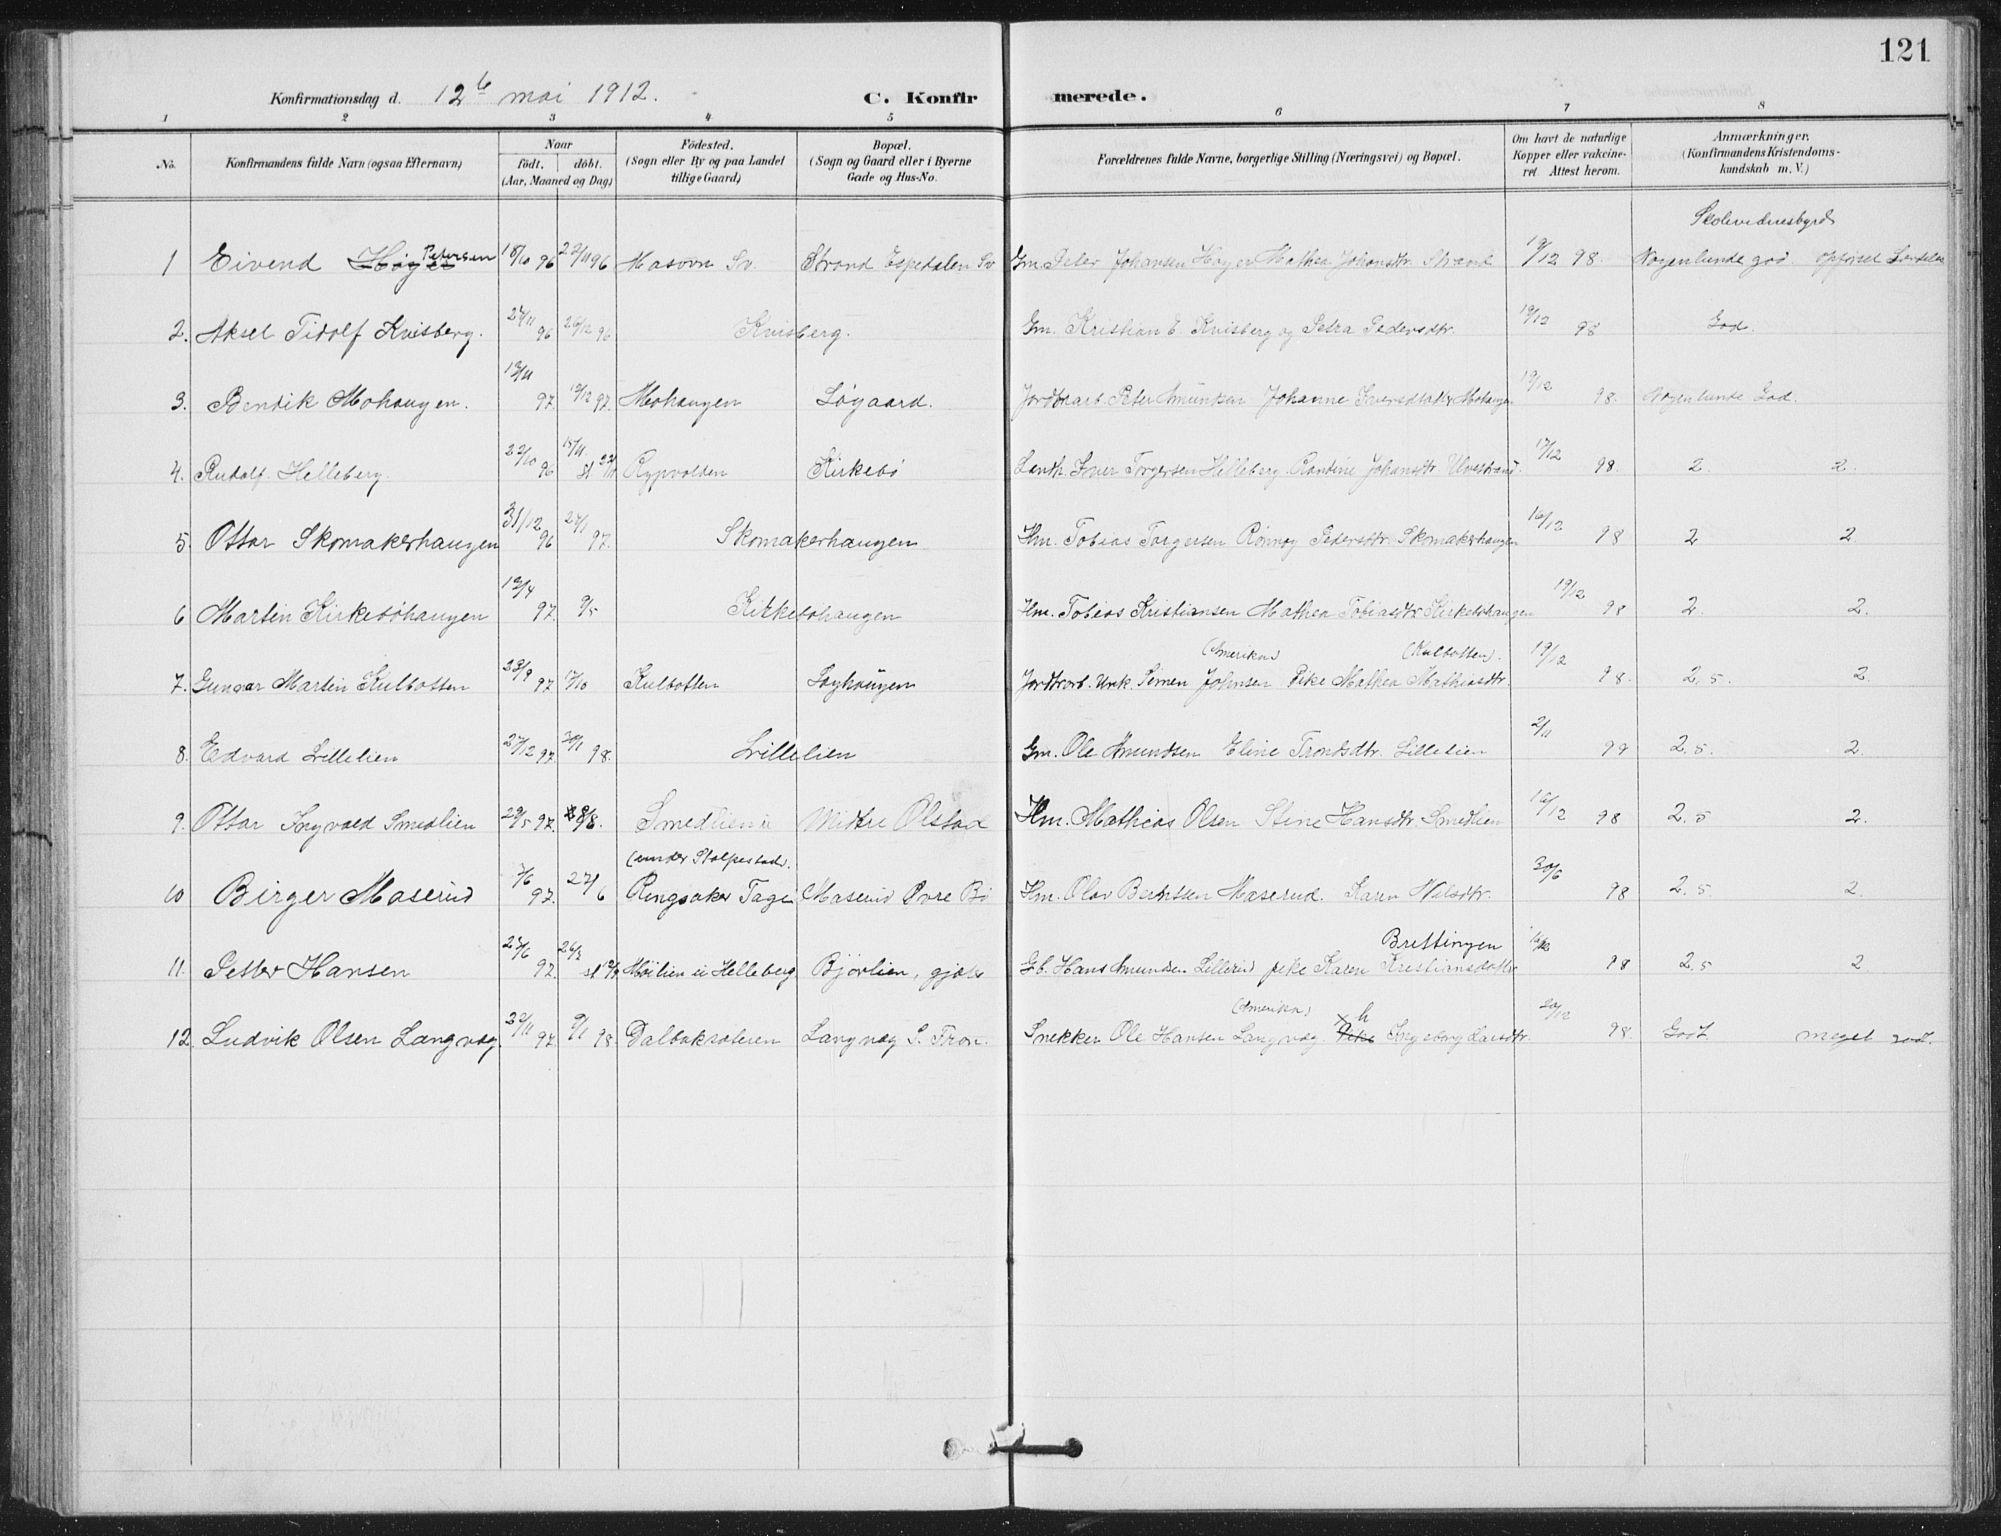 SAH, Vestre Gausdal prestekontor, Klokkerbok nr. 4, 1898-1939, s. 121